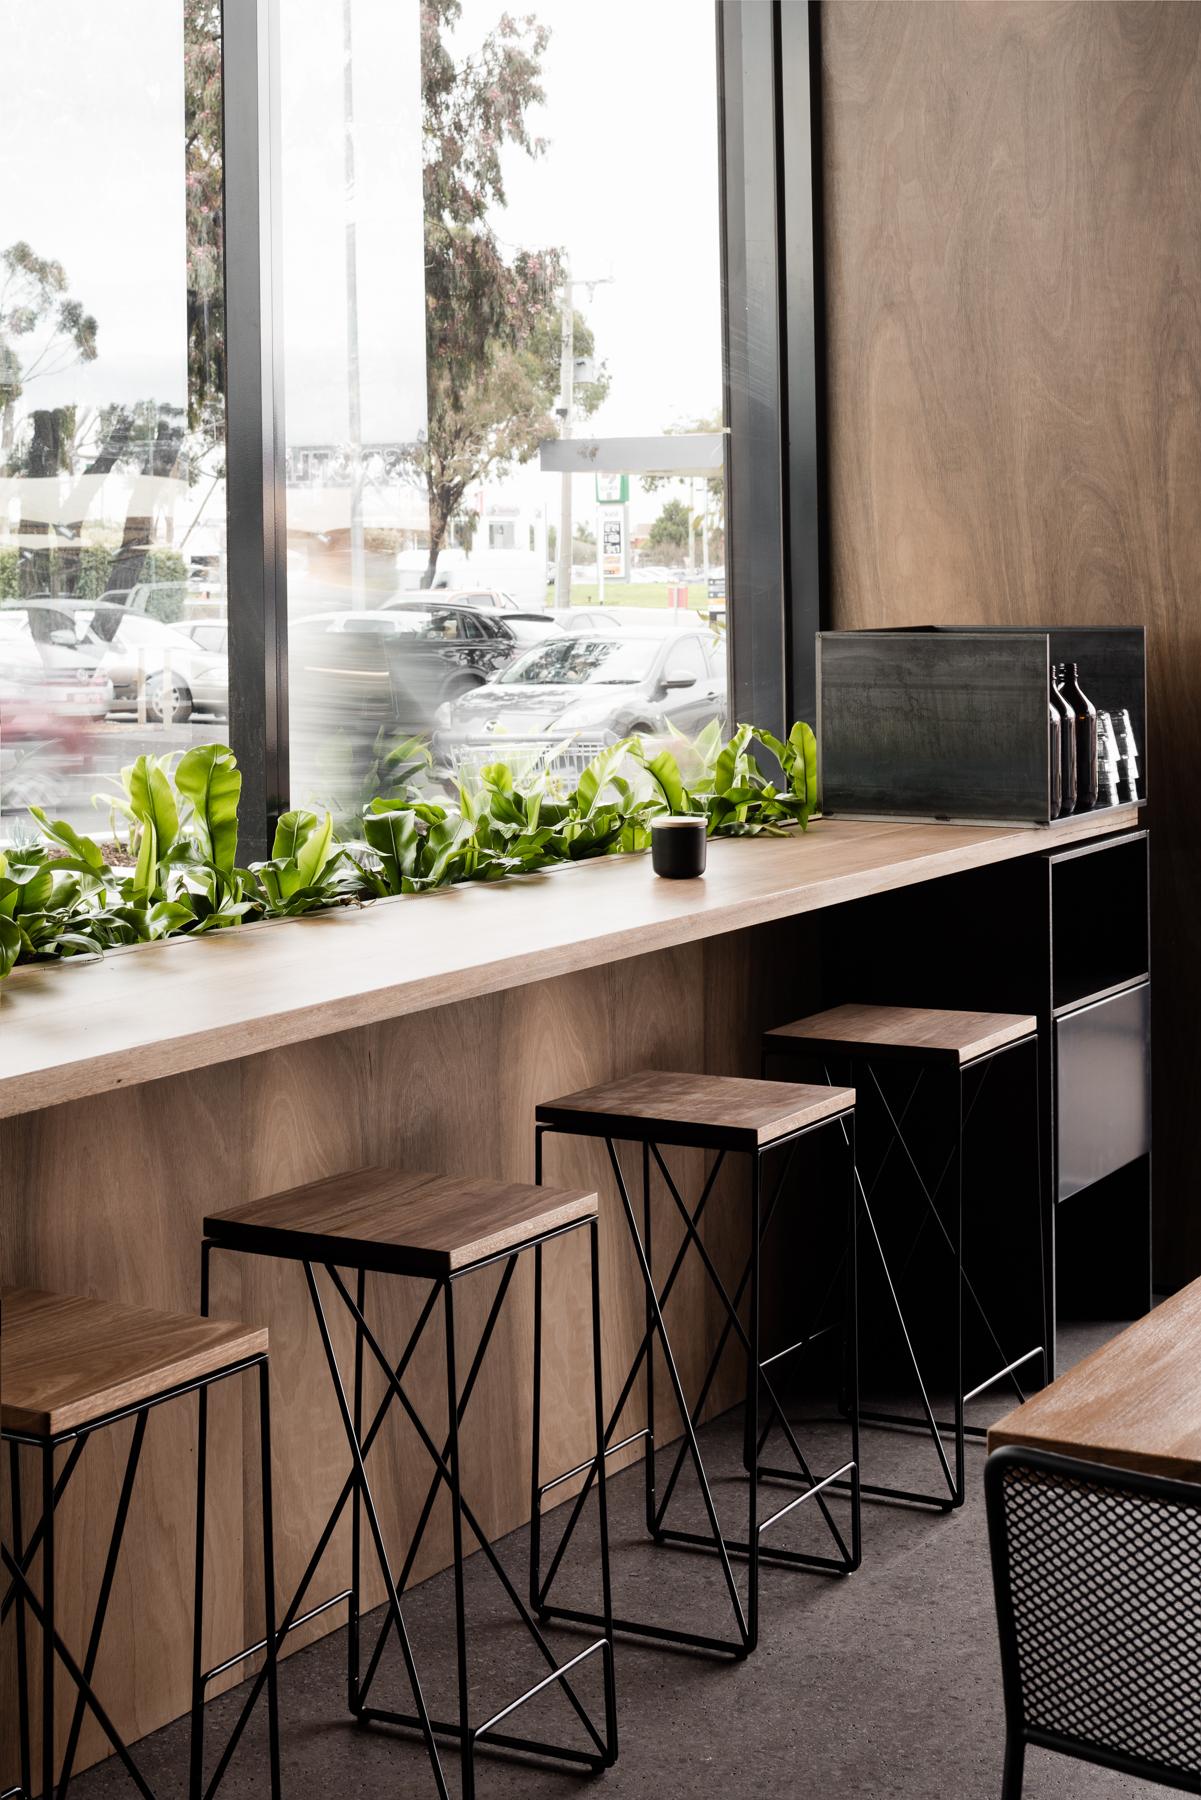 Design Window: Morris & Heath By Ritz & Ghougassian